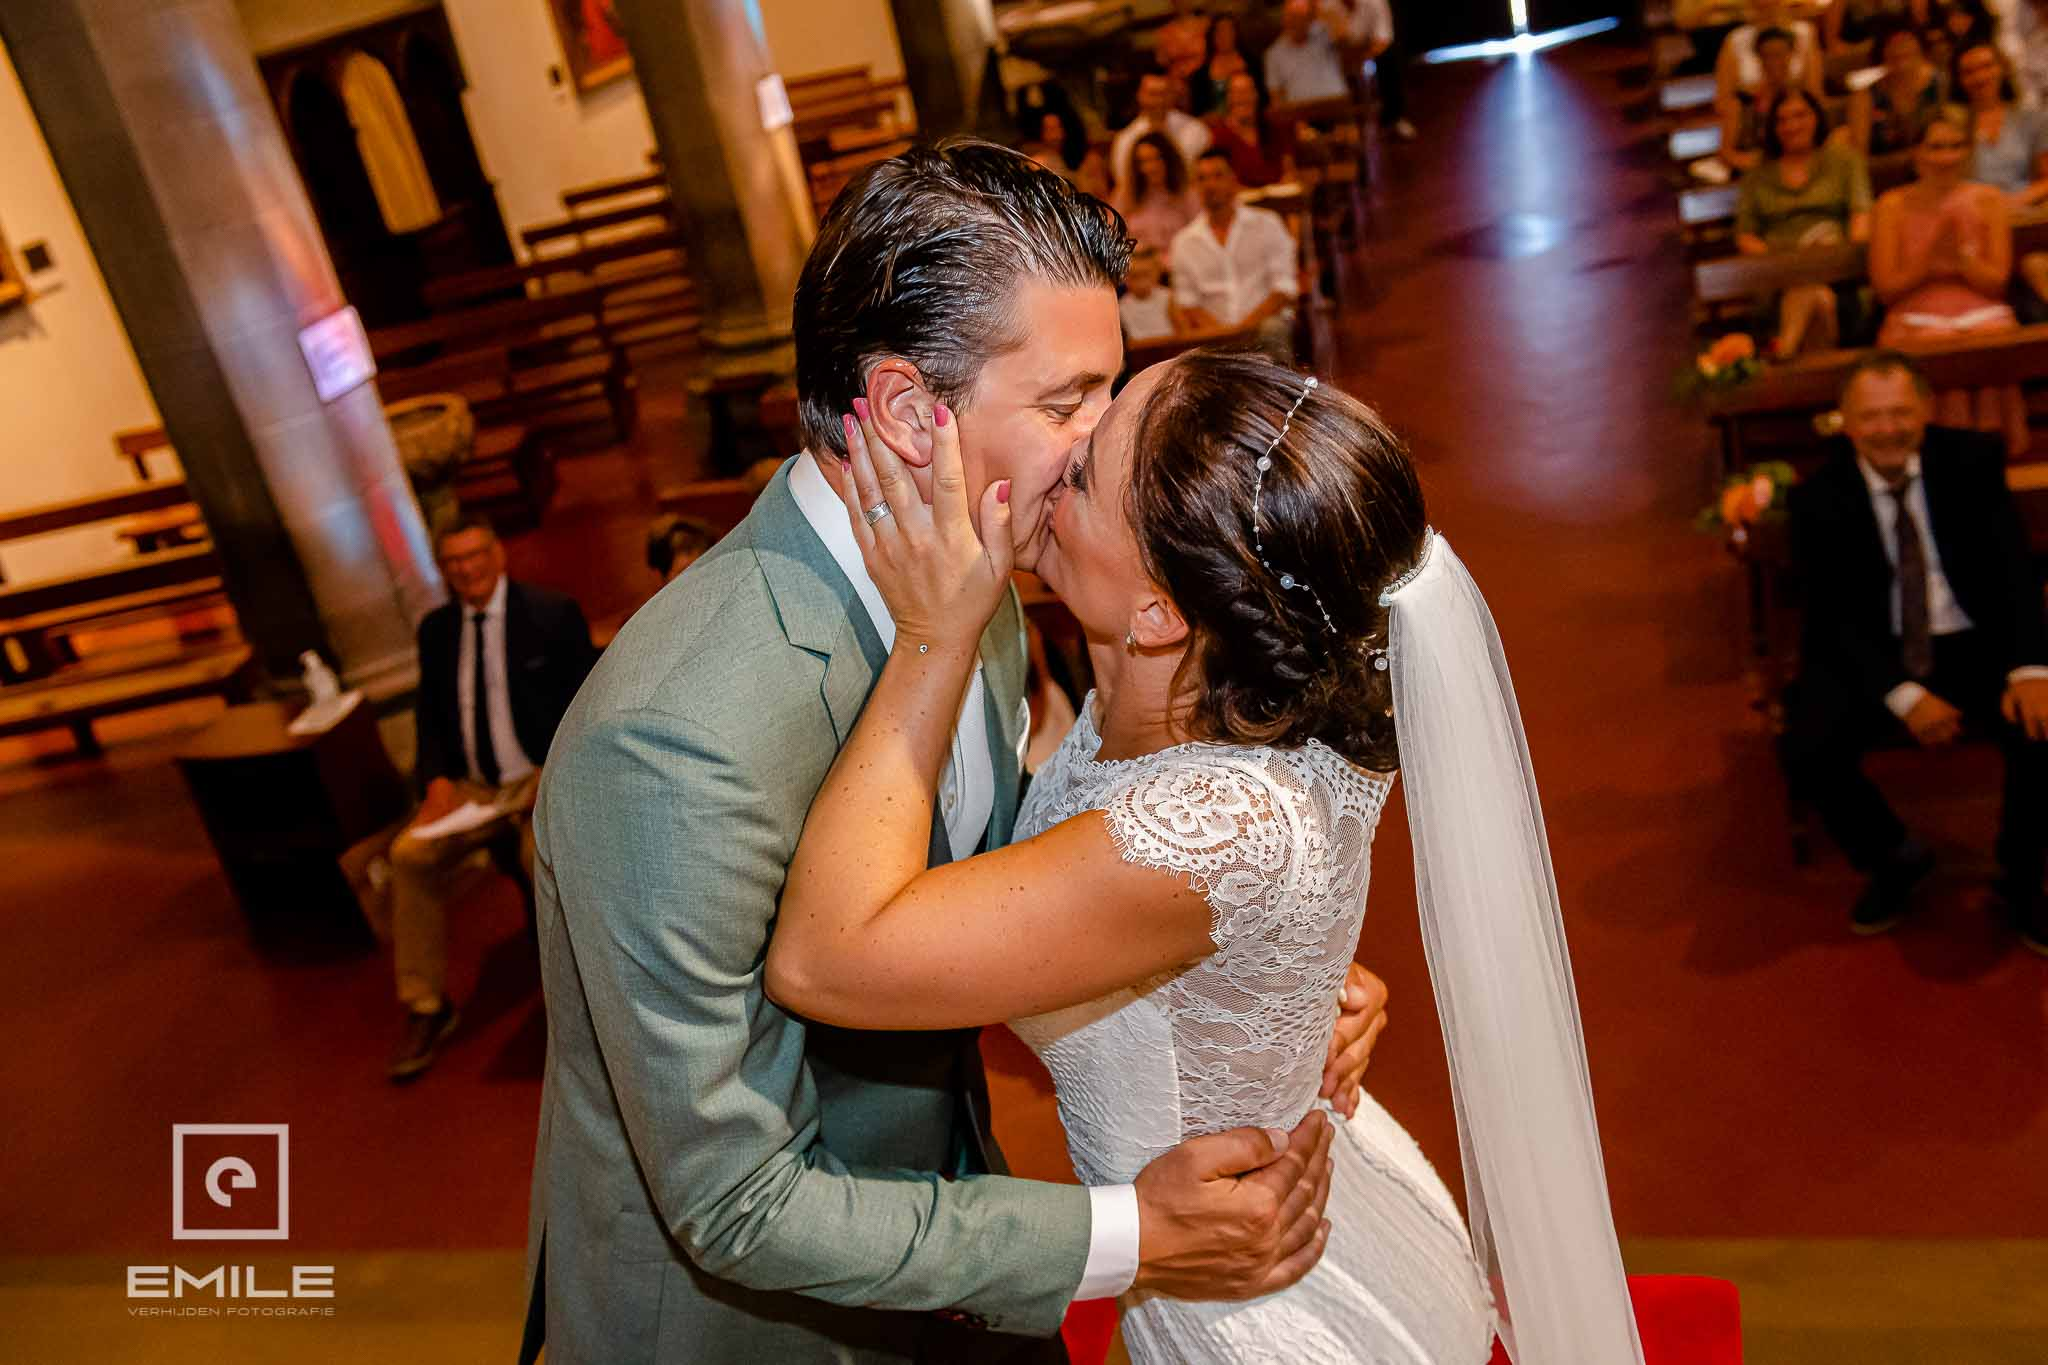 De kus, eindelijk getrouwd! Destination wedding San Gimignano - Toscane Italie - Iris en Job